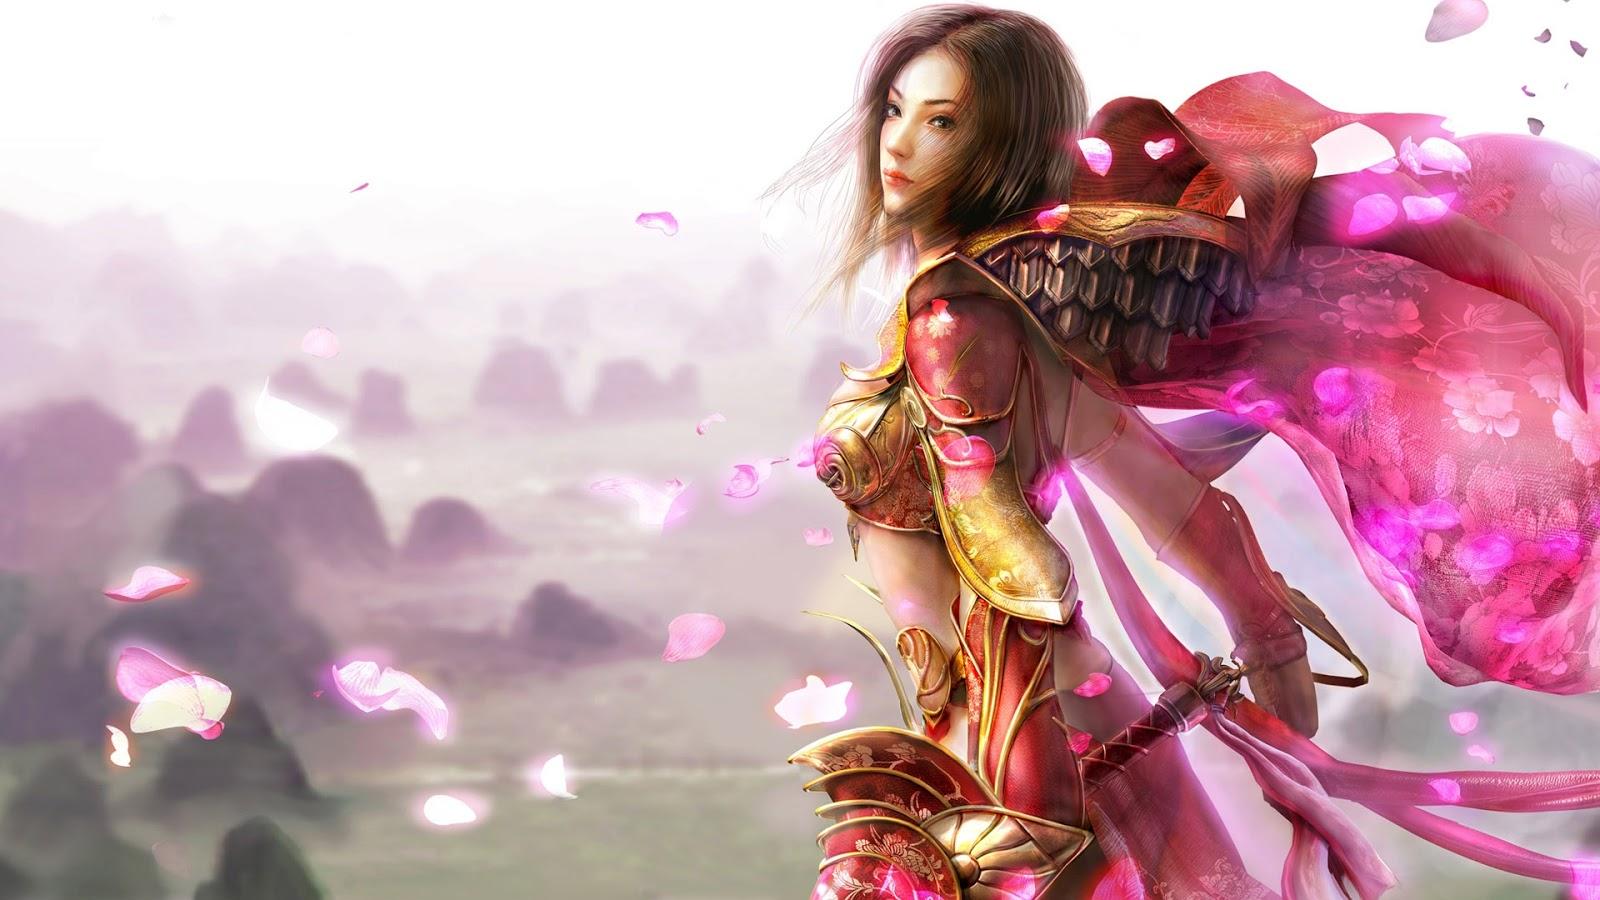 HD 3D Fantasy Girls Wallpapers 1600x900